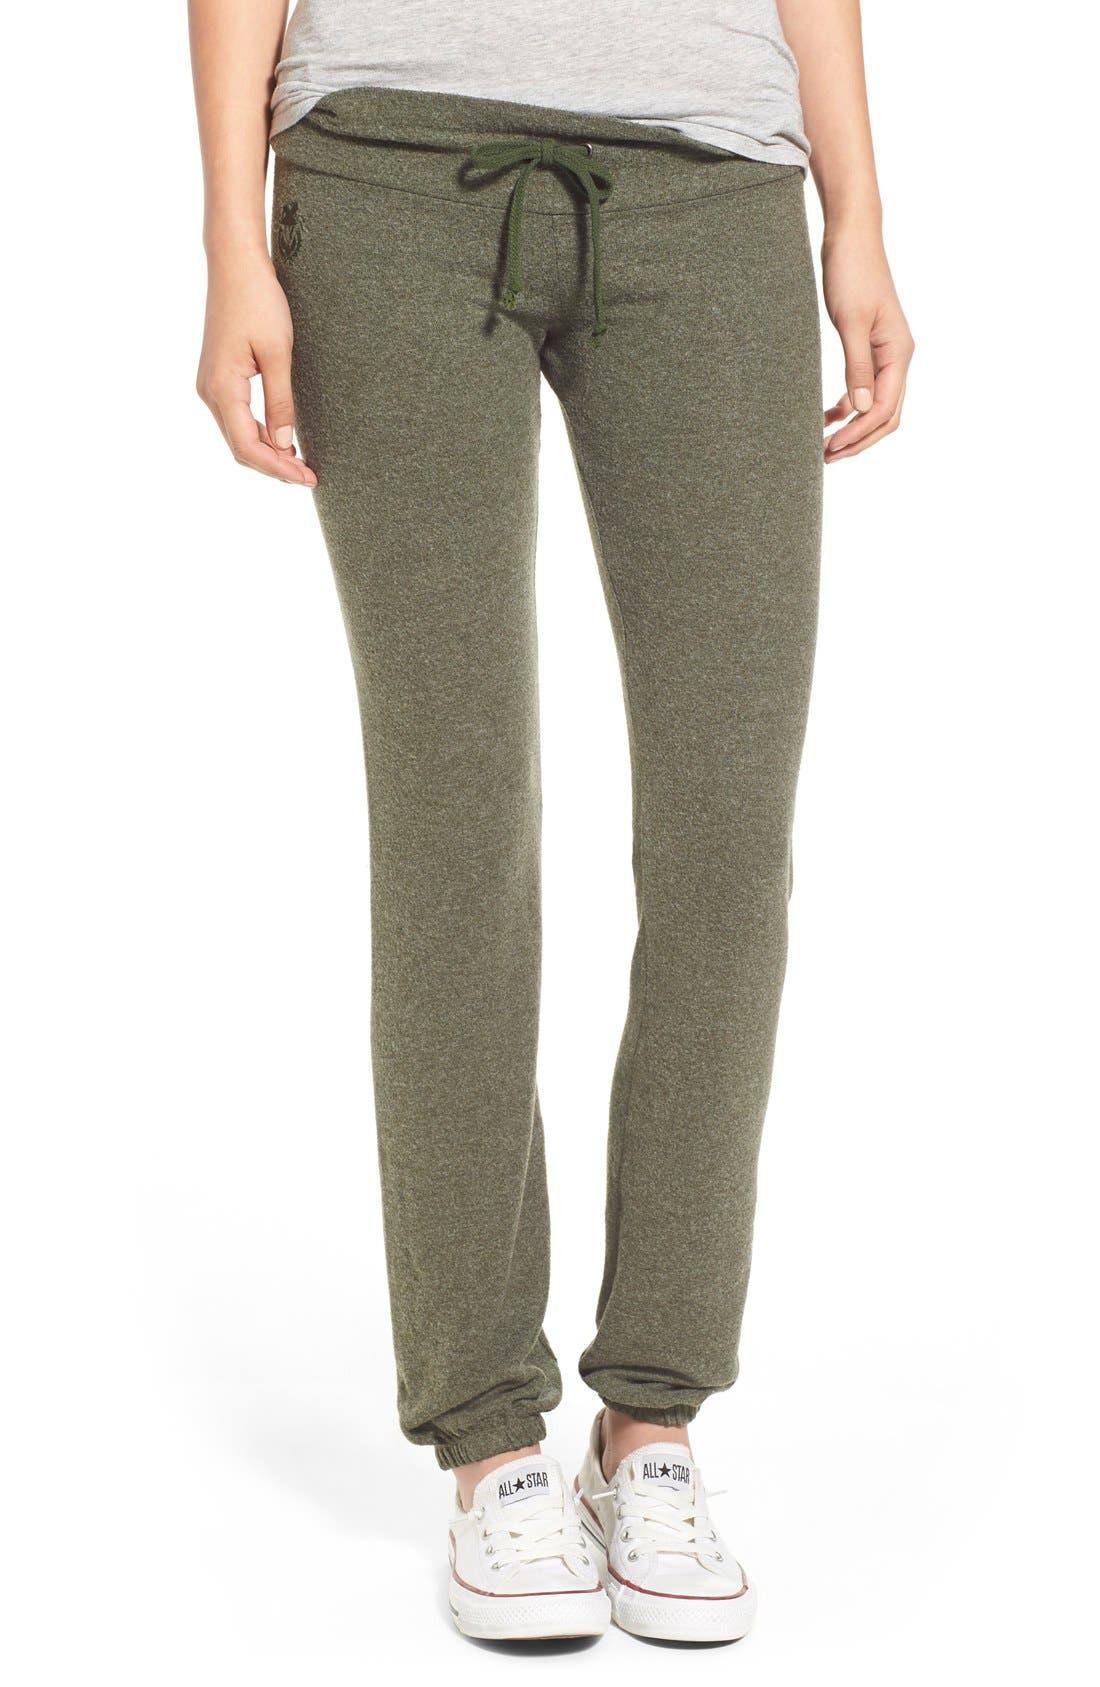 Main Image - Wildfox 'Basics - Malibu' Skinny Jogging Pants